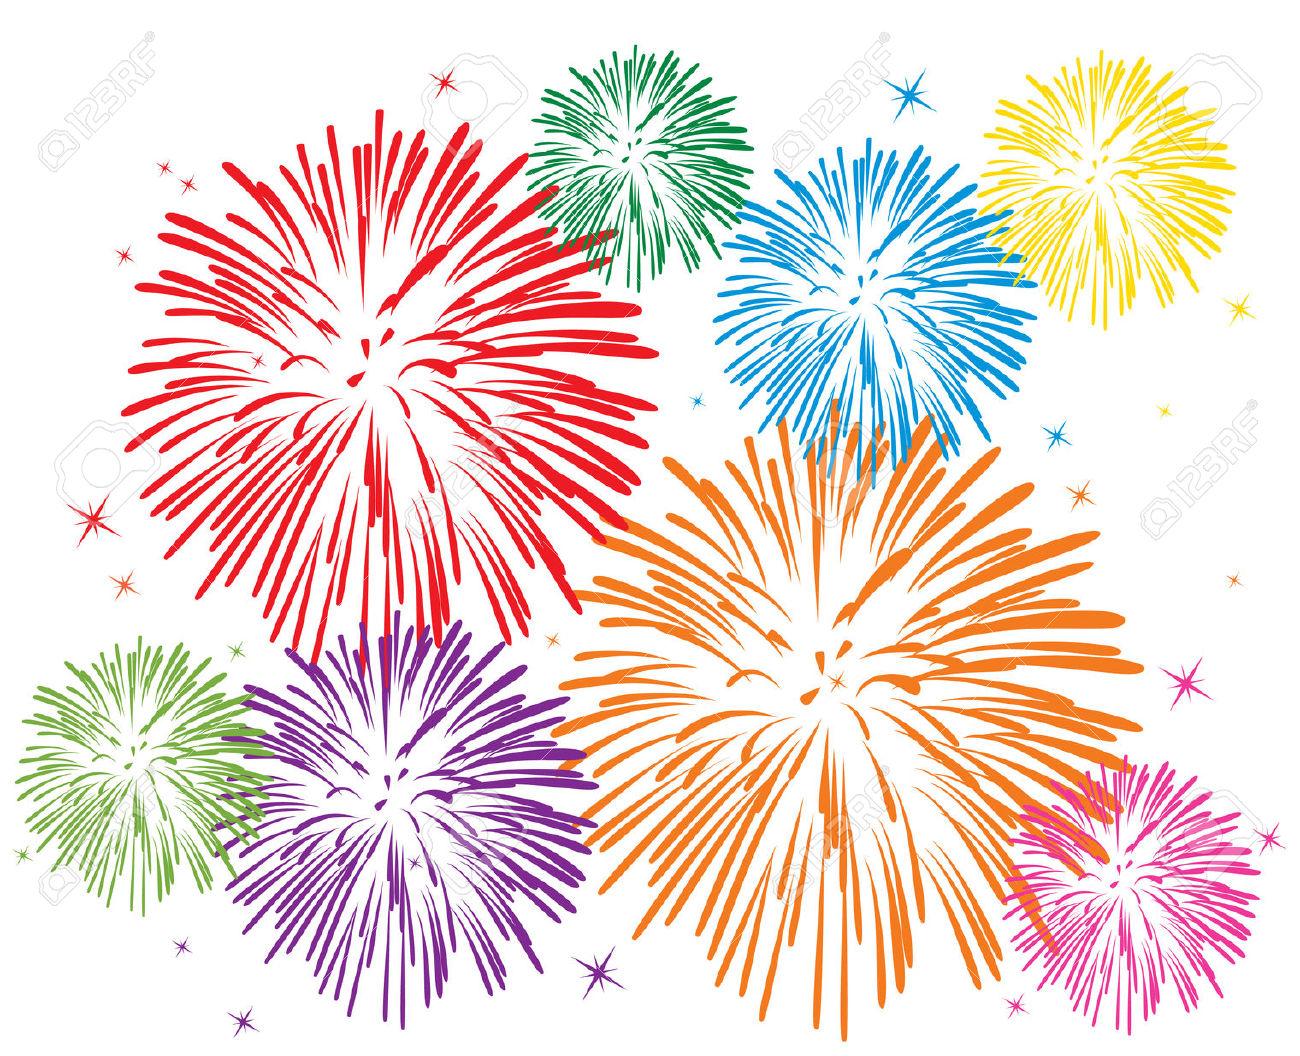 Fireworks Clipart #6726